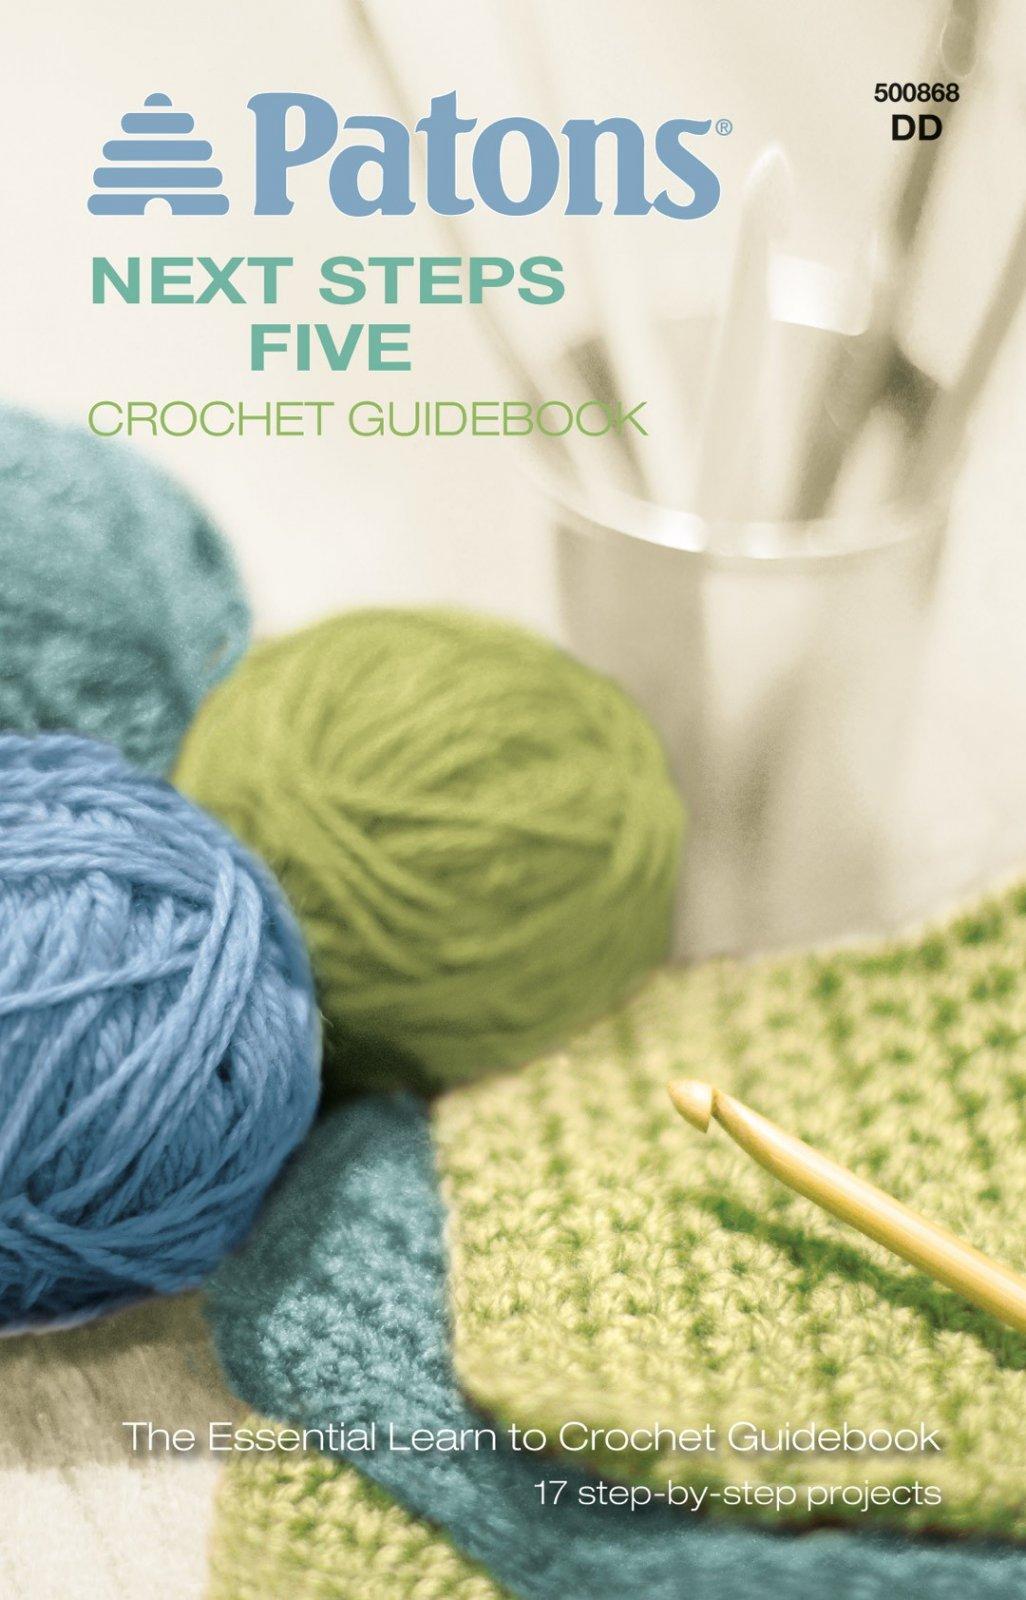 Crochet Guidebook - Patons Next Steps 5